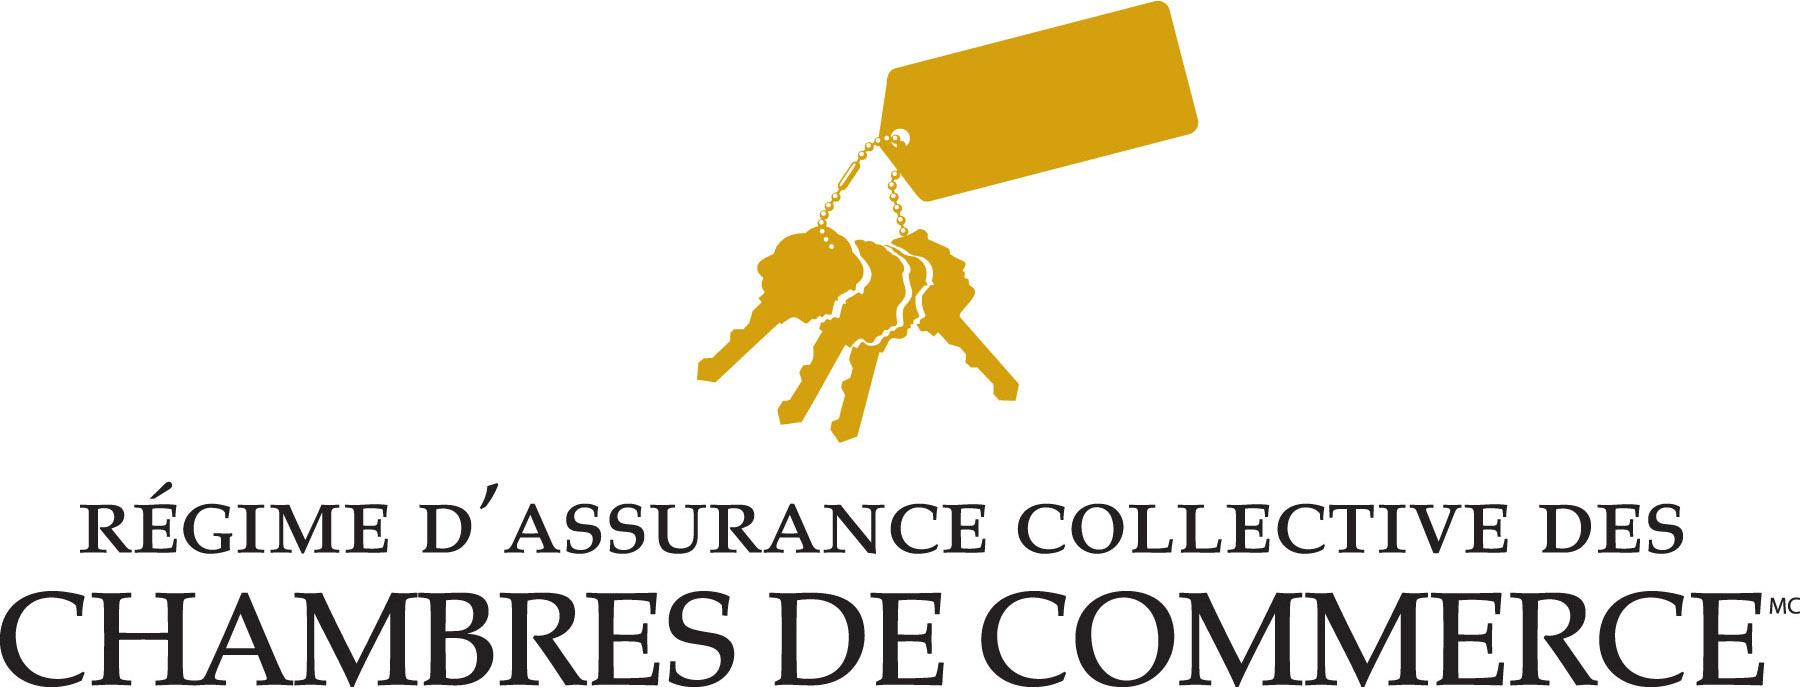 logo Regime Ass Collective CC